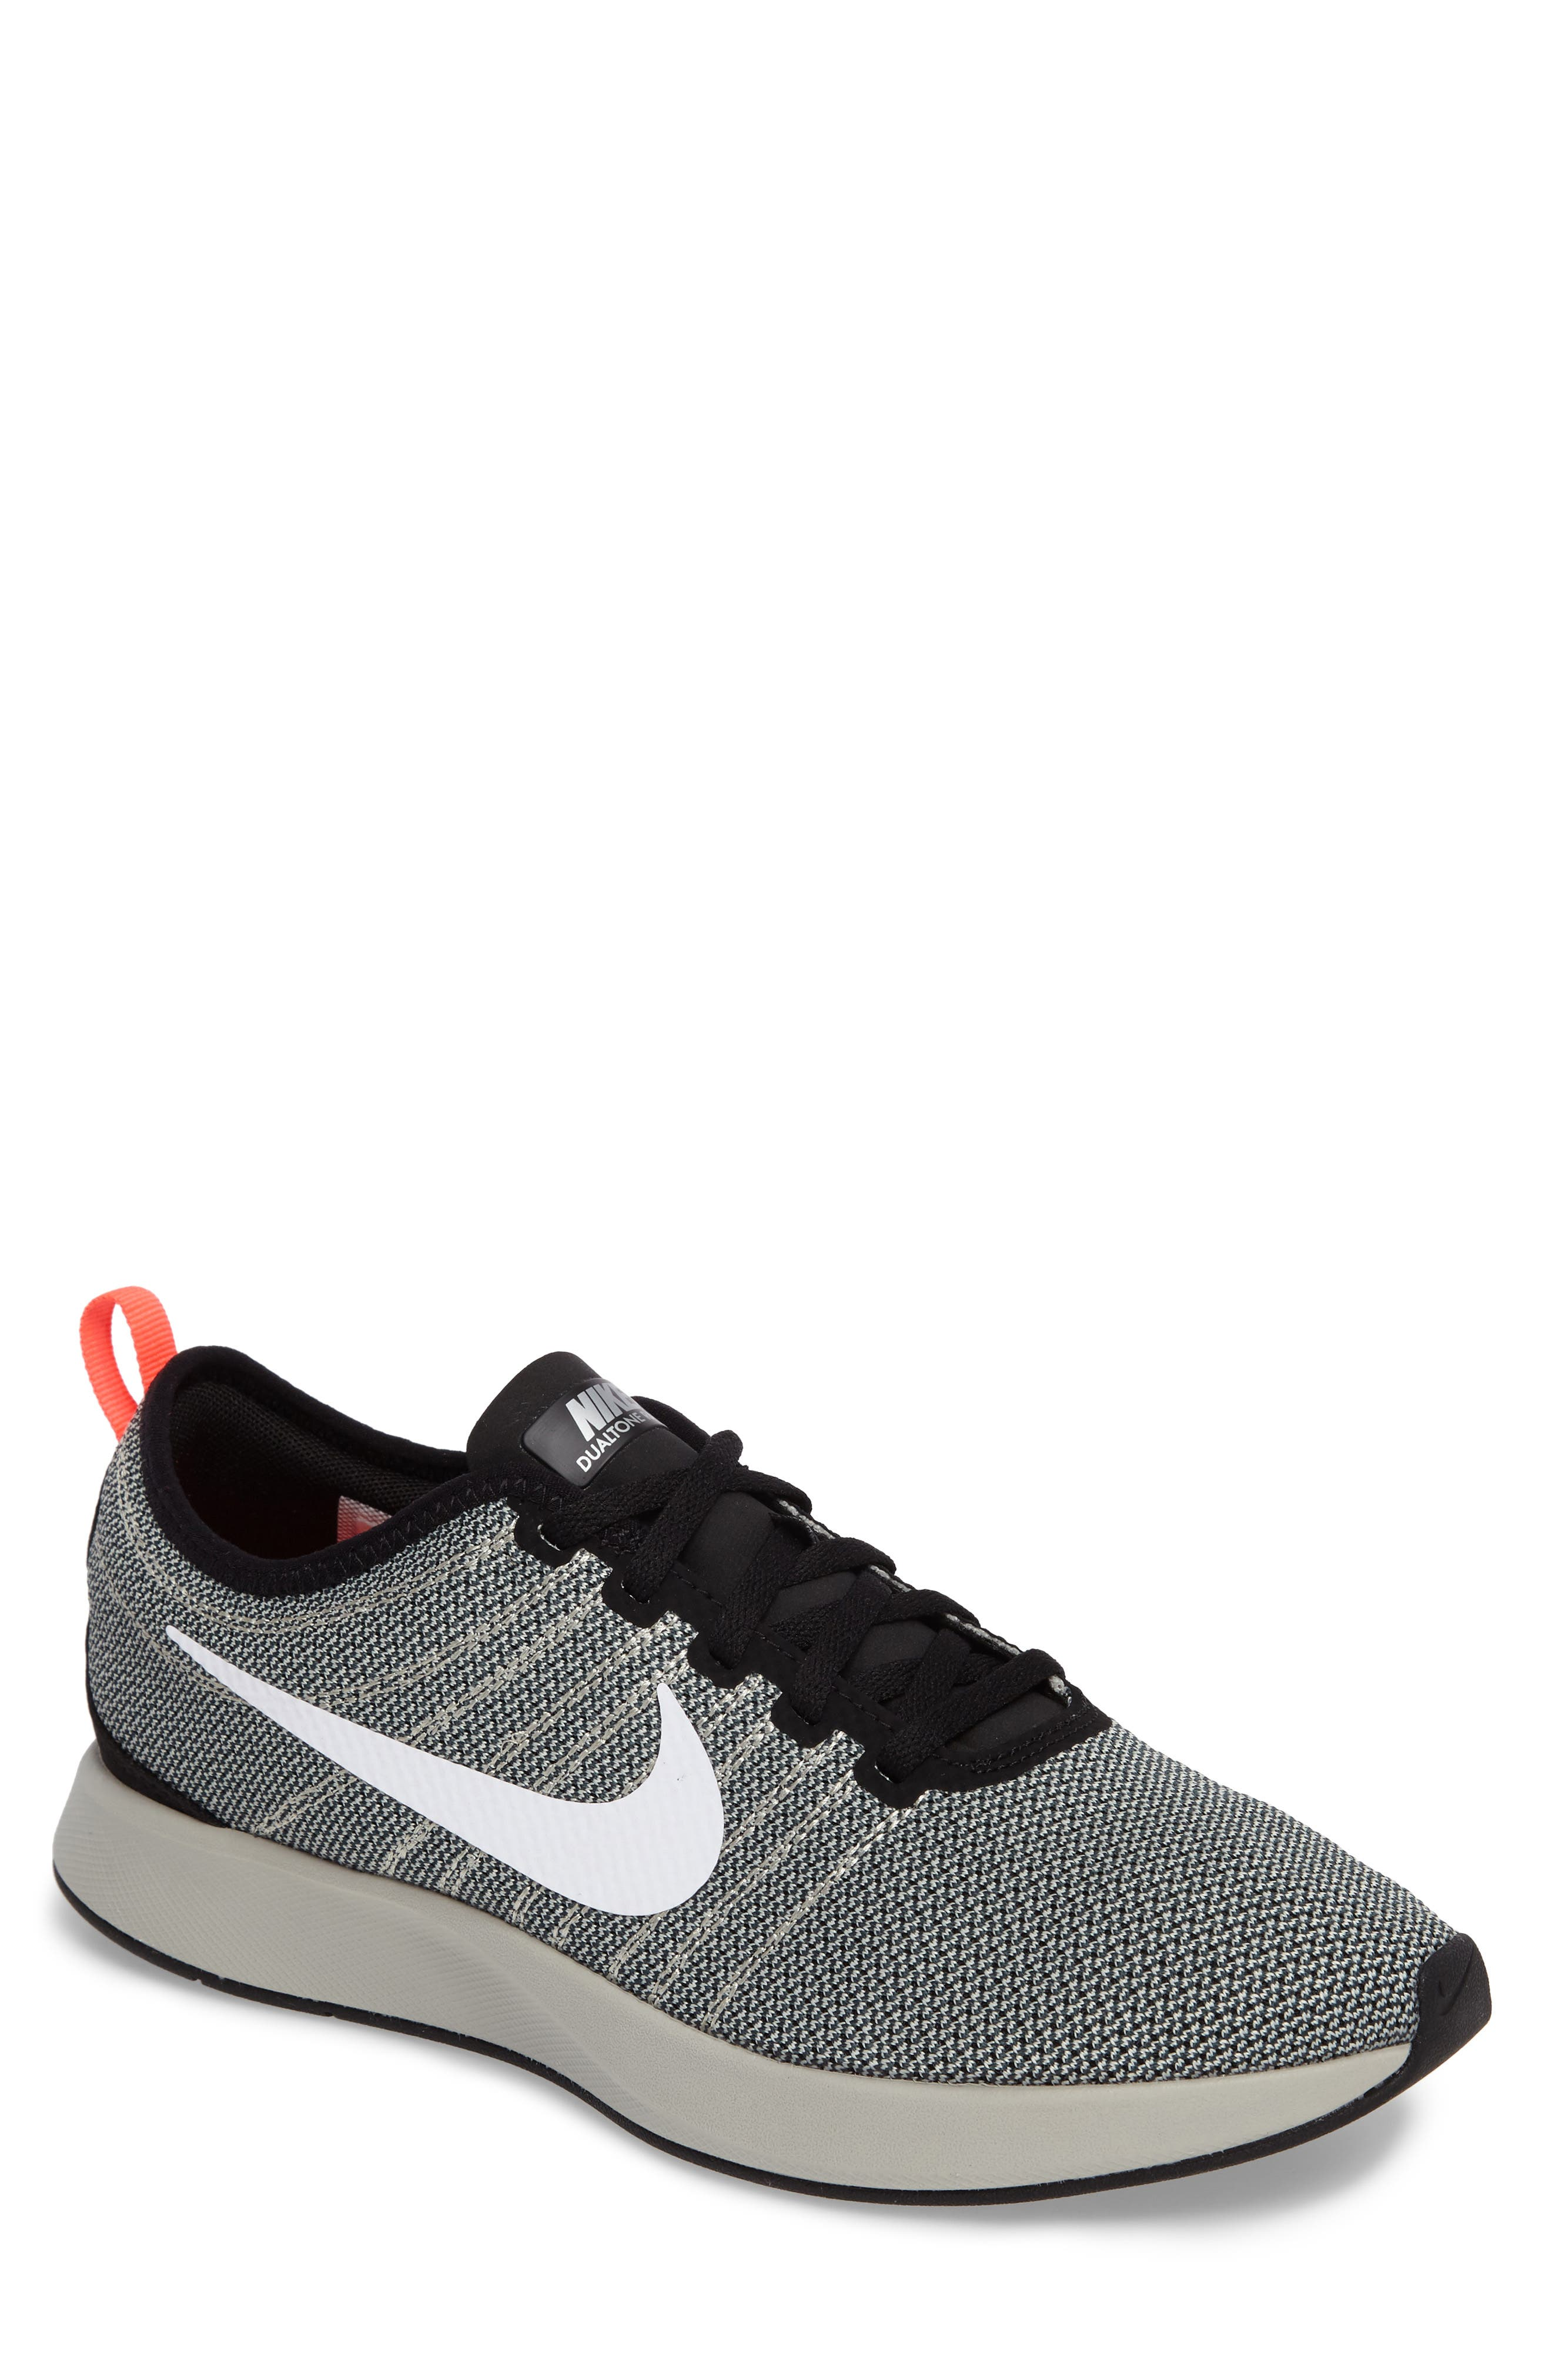 Alternate Image 1 Selected - Nike Dualtone Racer Running Shoe (Men)